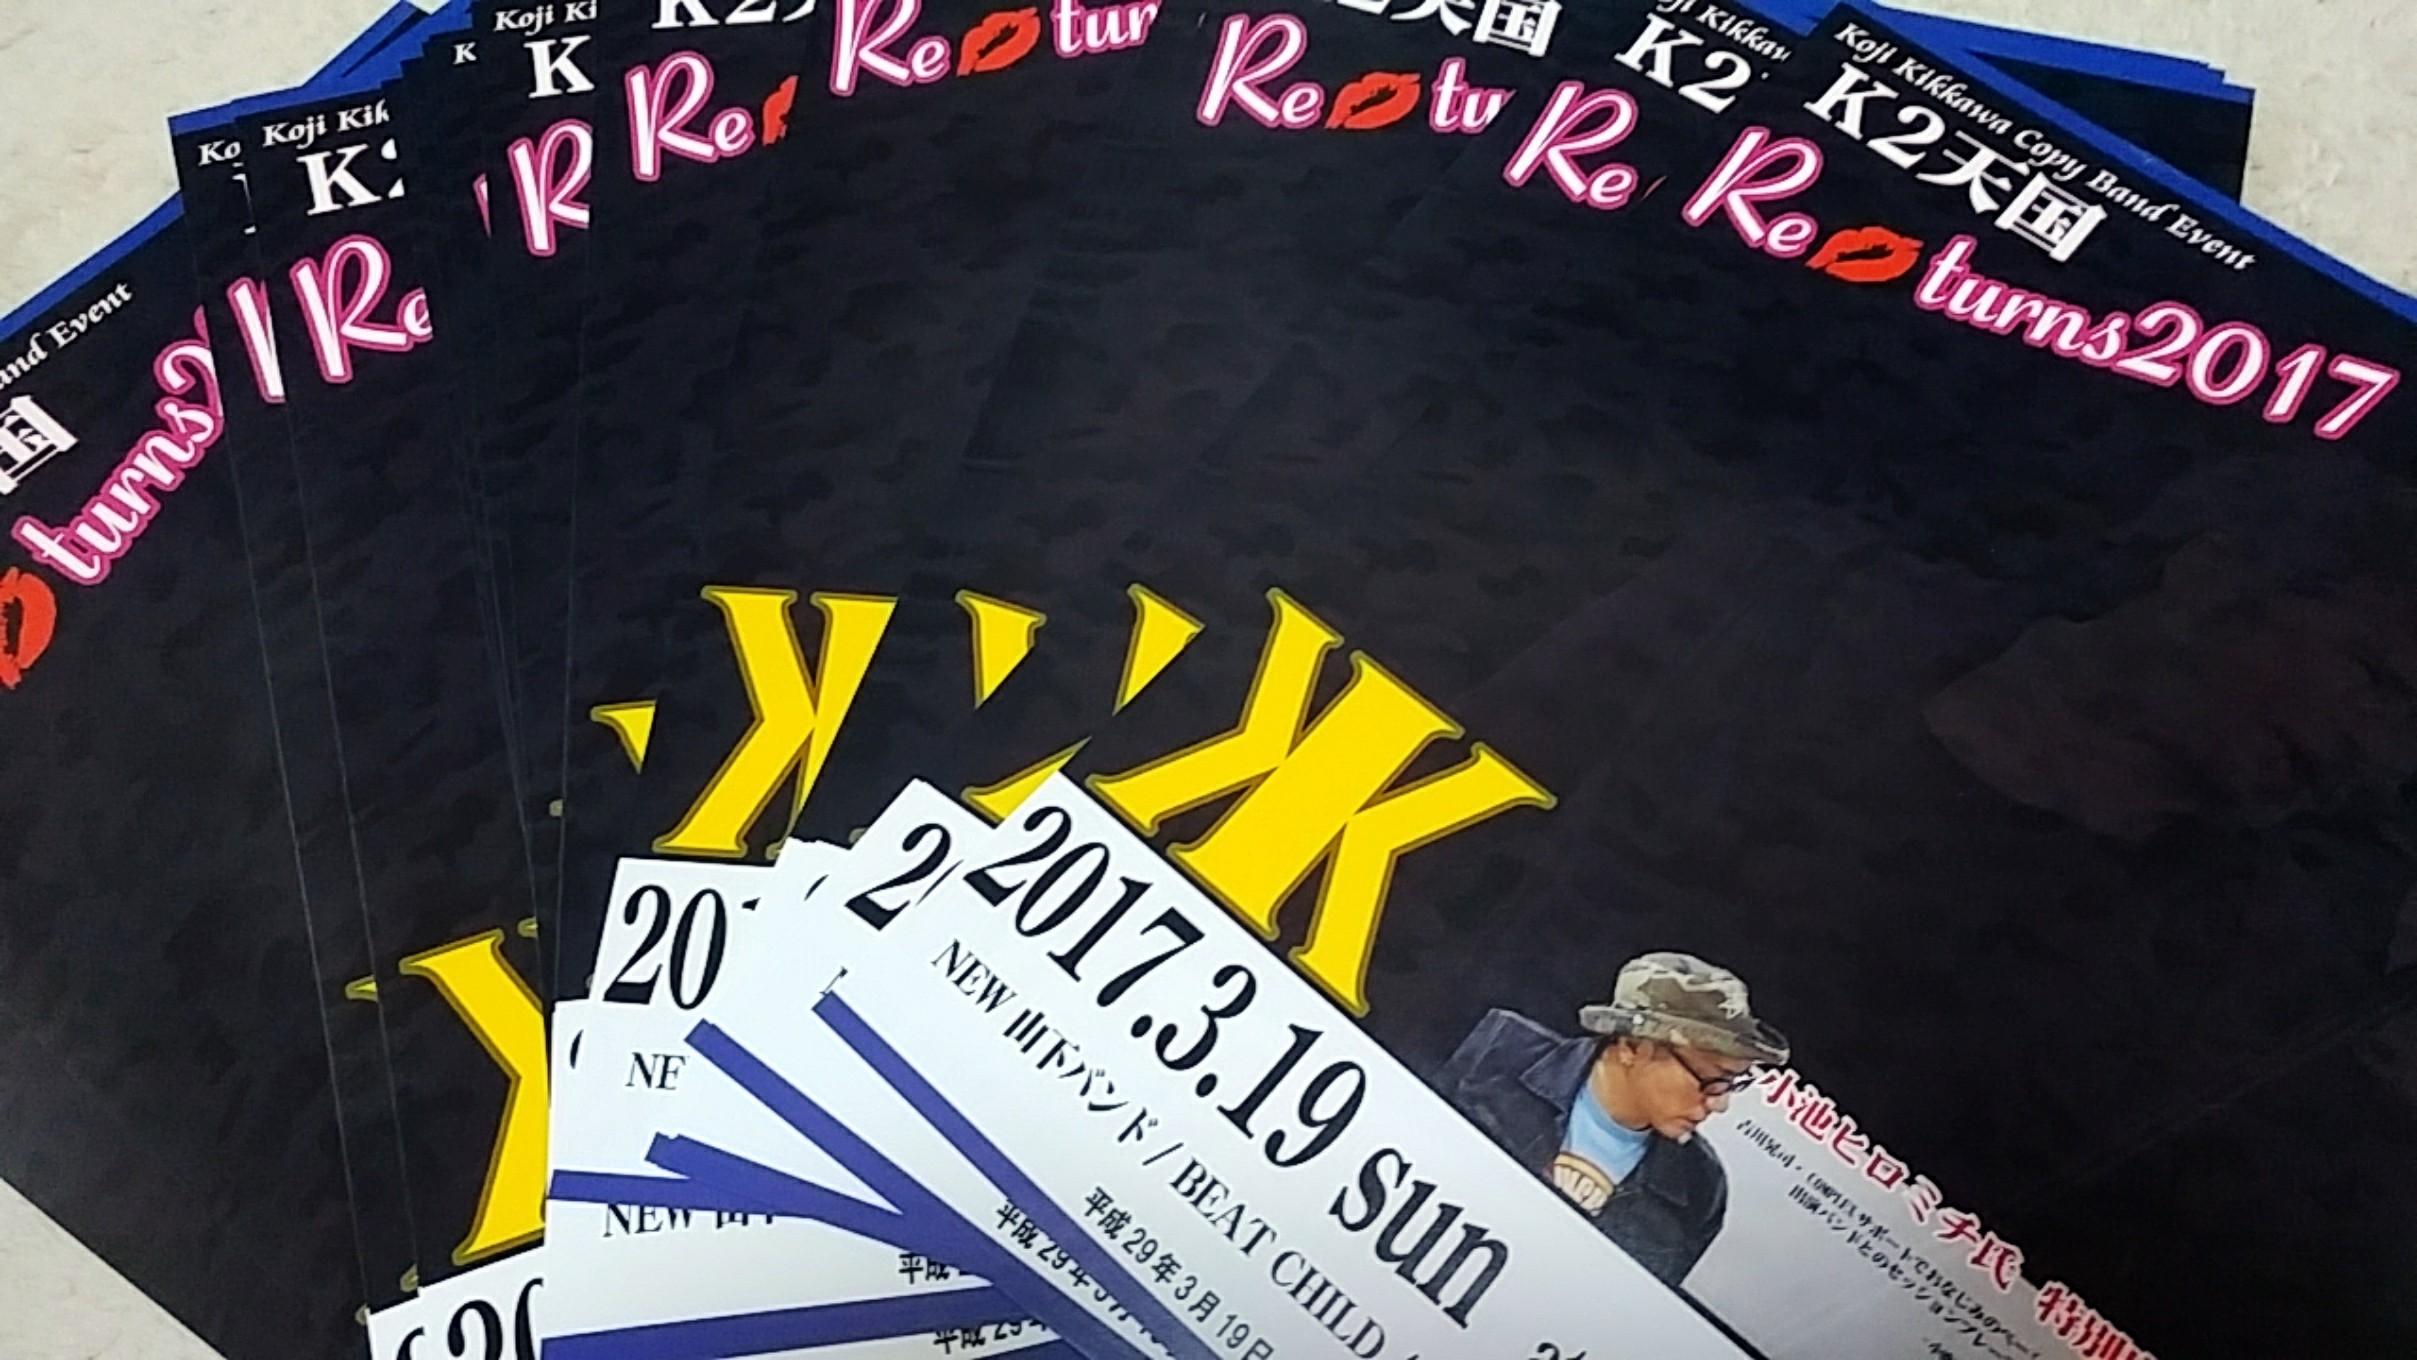 『K2天国 Returns2017』スタジオリハ